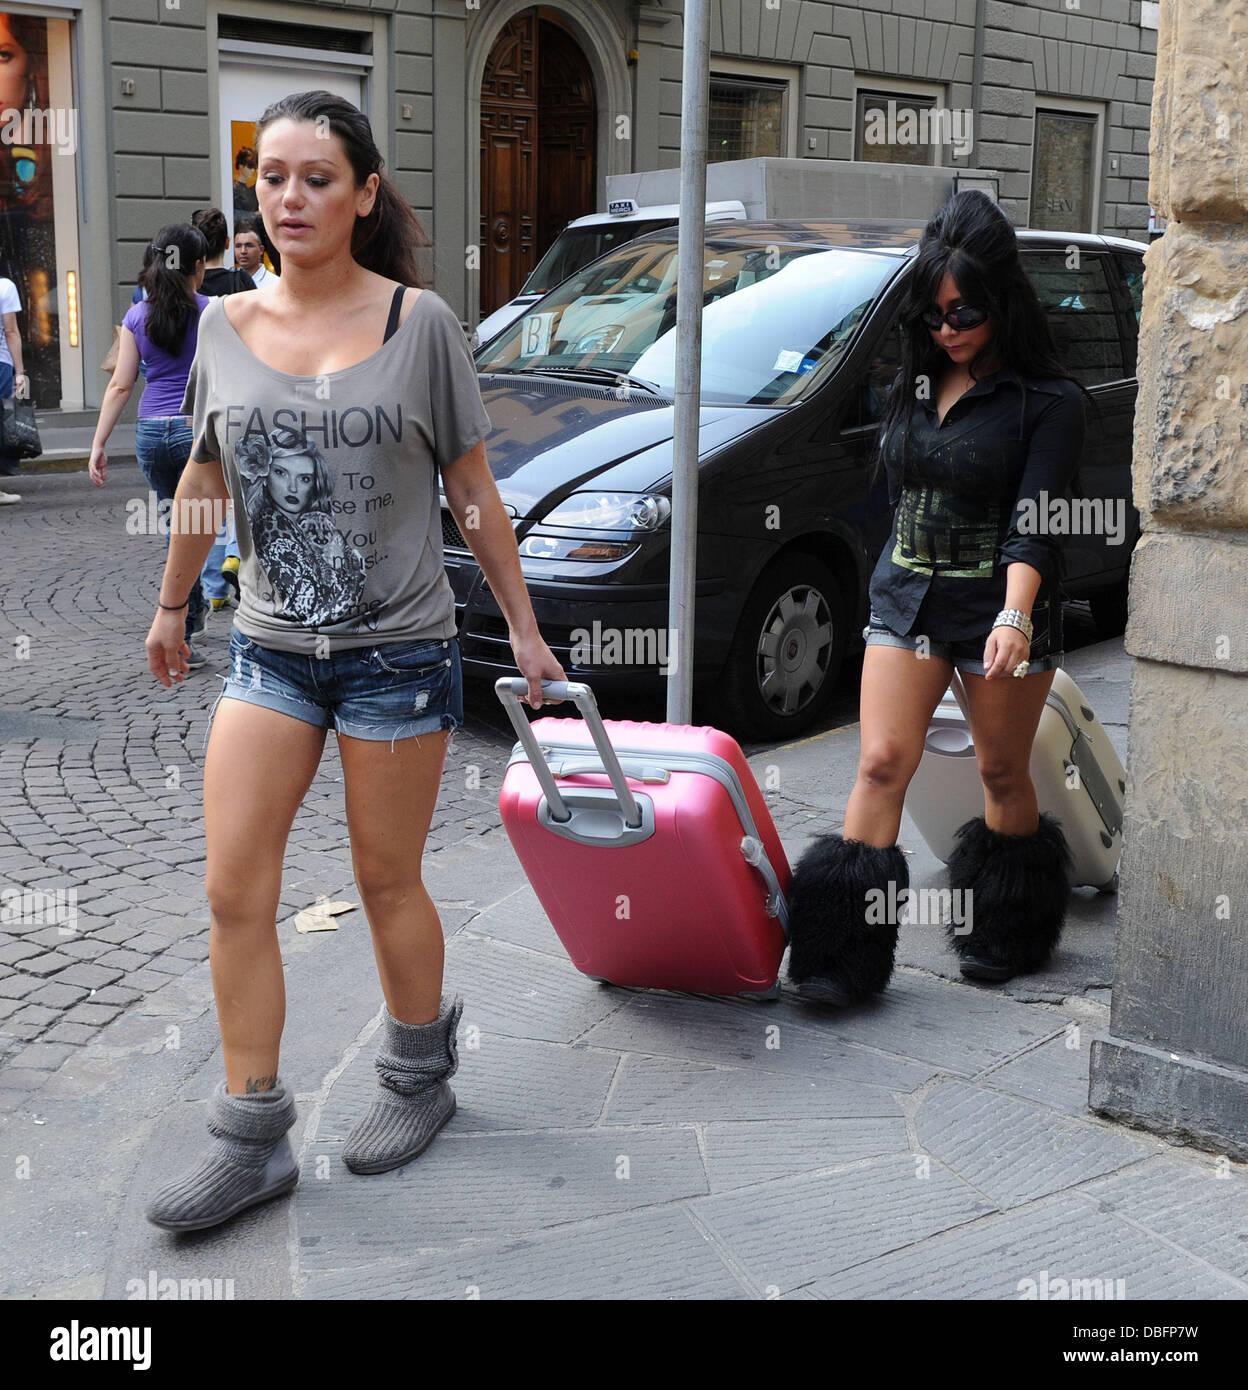 Nicole 'Snooki' Polizzi and Jenni 'Jwoww' Farley shop in the San Lorenzo markets of Florence. The - Stock Image